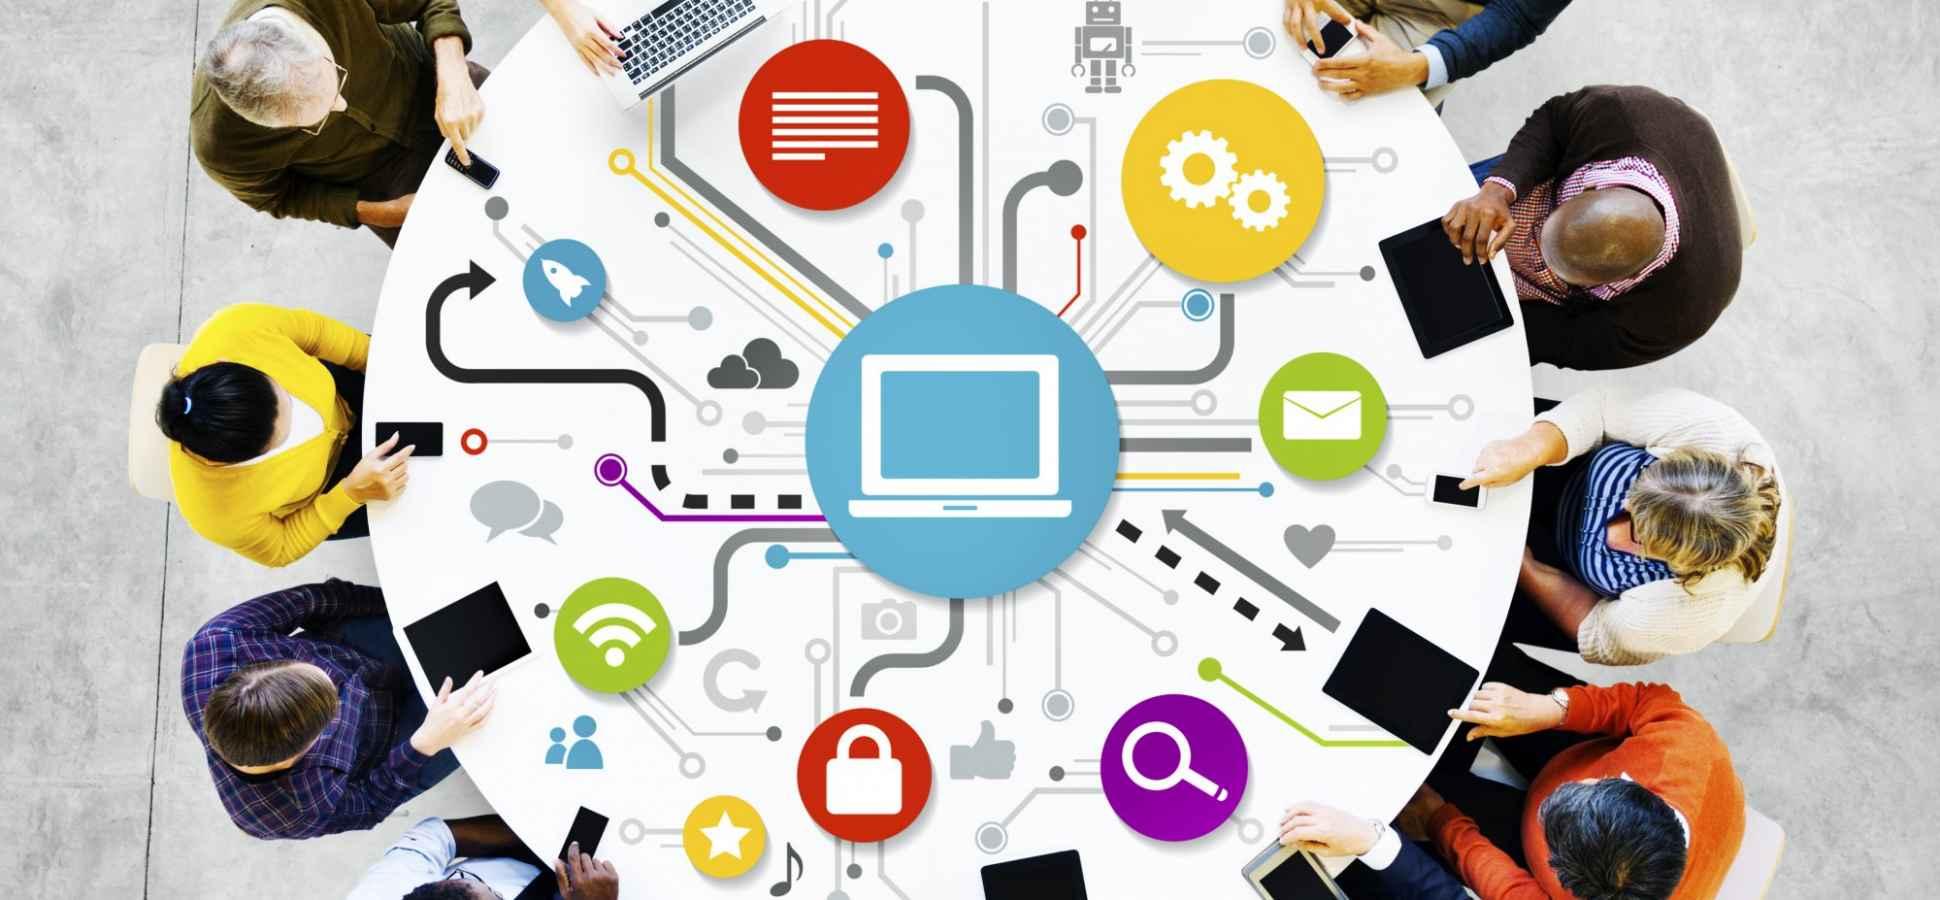 10 Best New Marketing Technologies of 2015